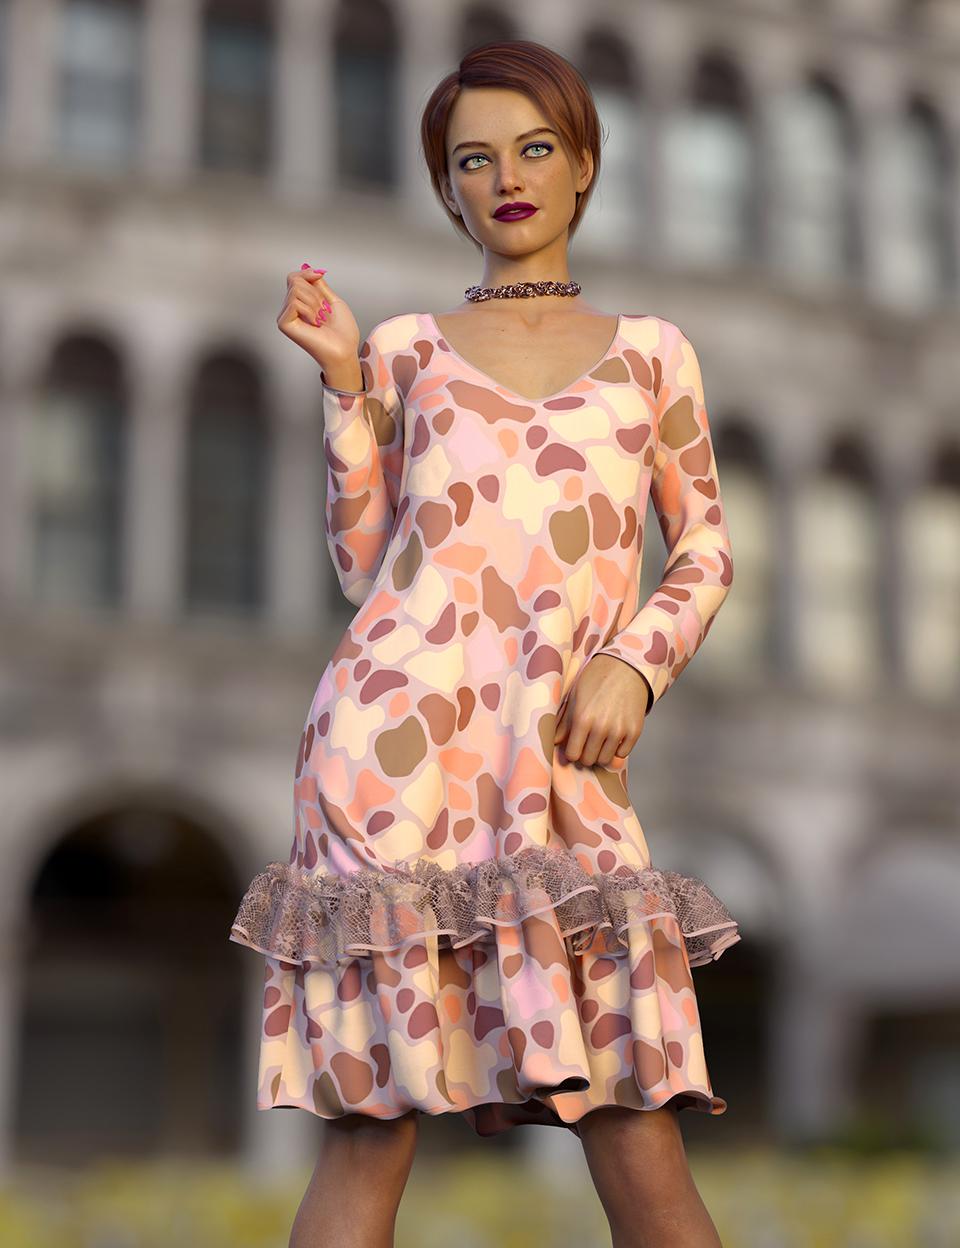 dForce Cindy Outfit for Genesis 8 Females by: Nelmi, 3D Models by Daz 3D